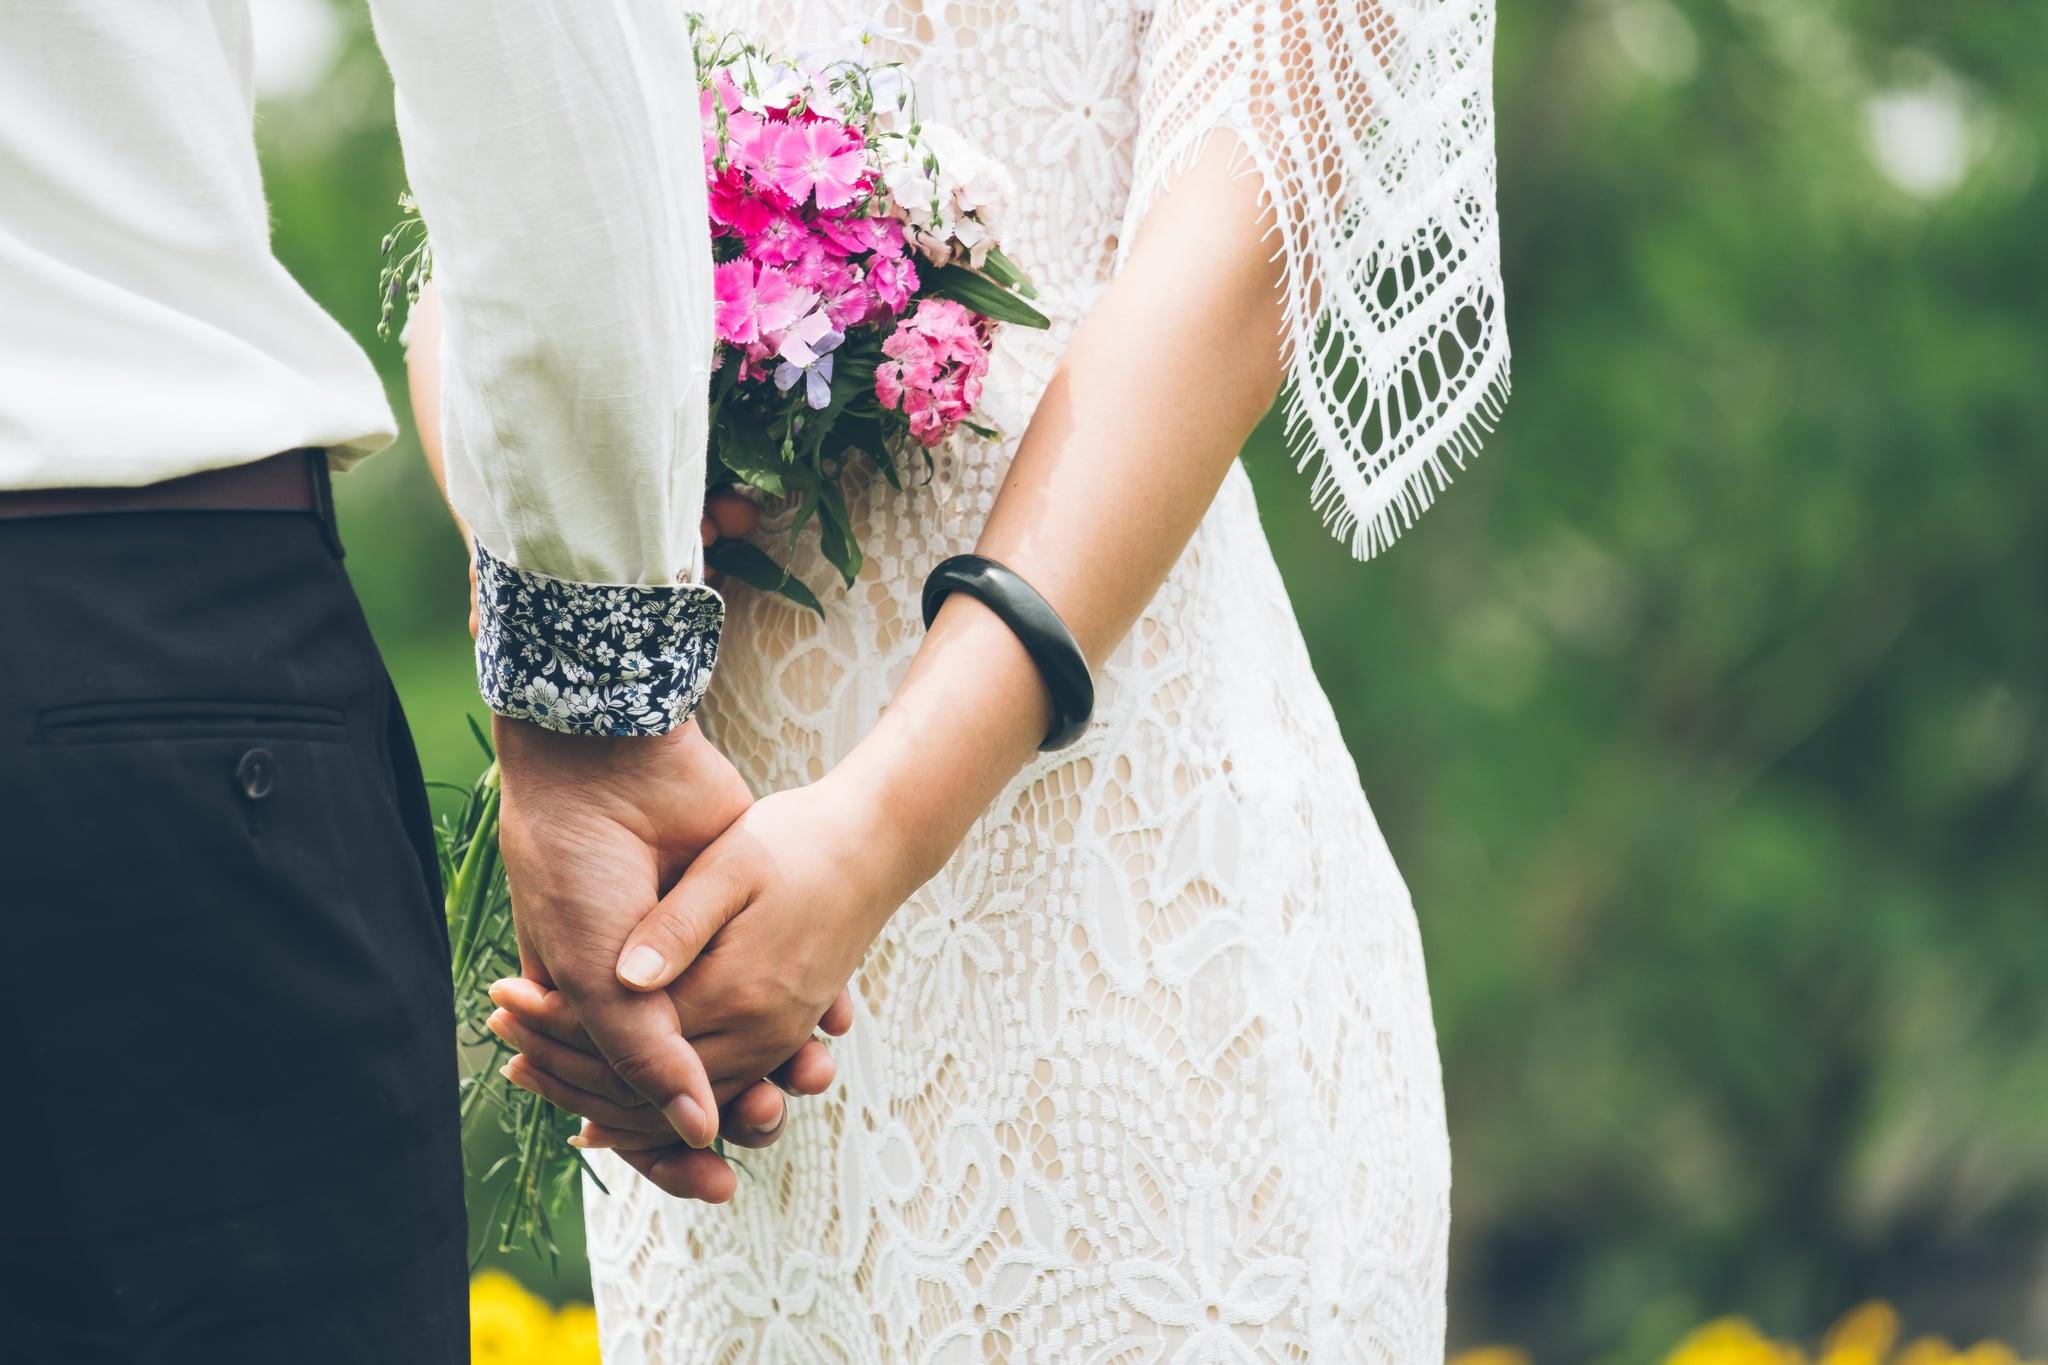 Parts Of A Wedding.Most Expensive Parts Of A Wedding Popsugar Australia Love